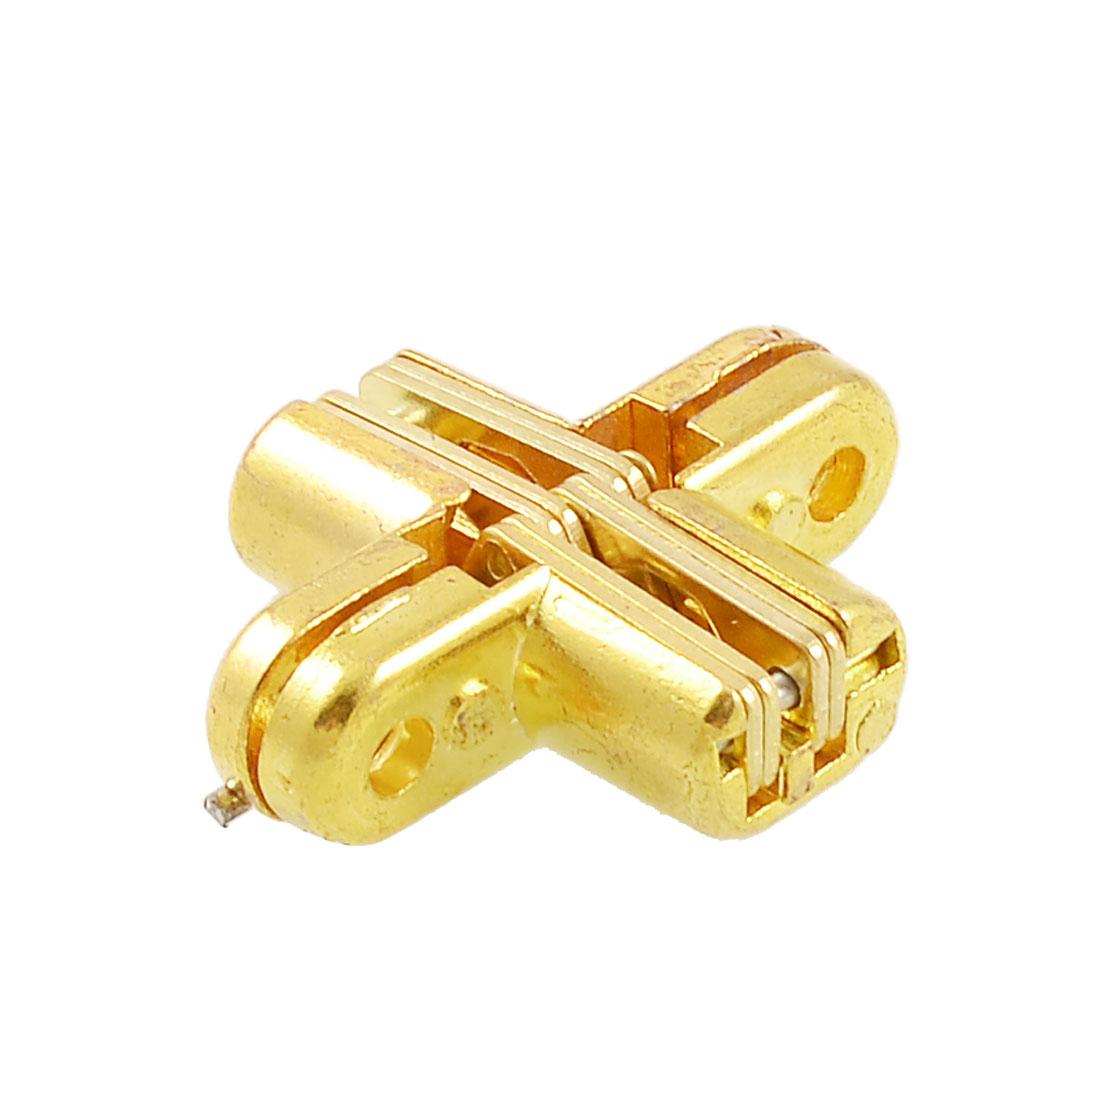 Furniture Metal Cross Hinge Gold Tone for Folding Slideing Door